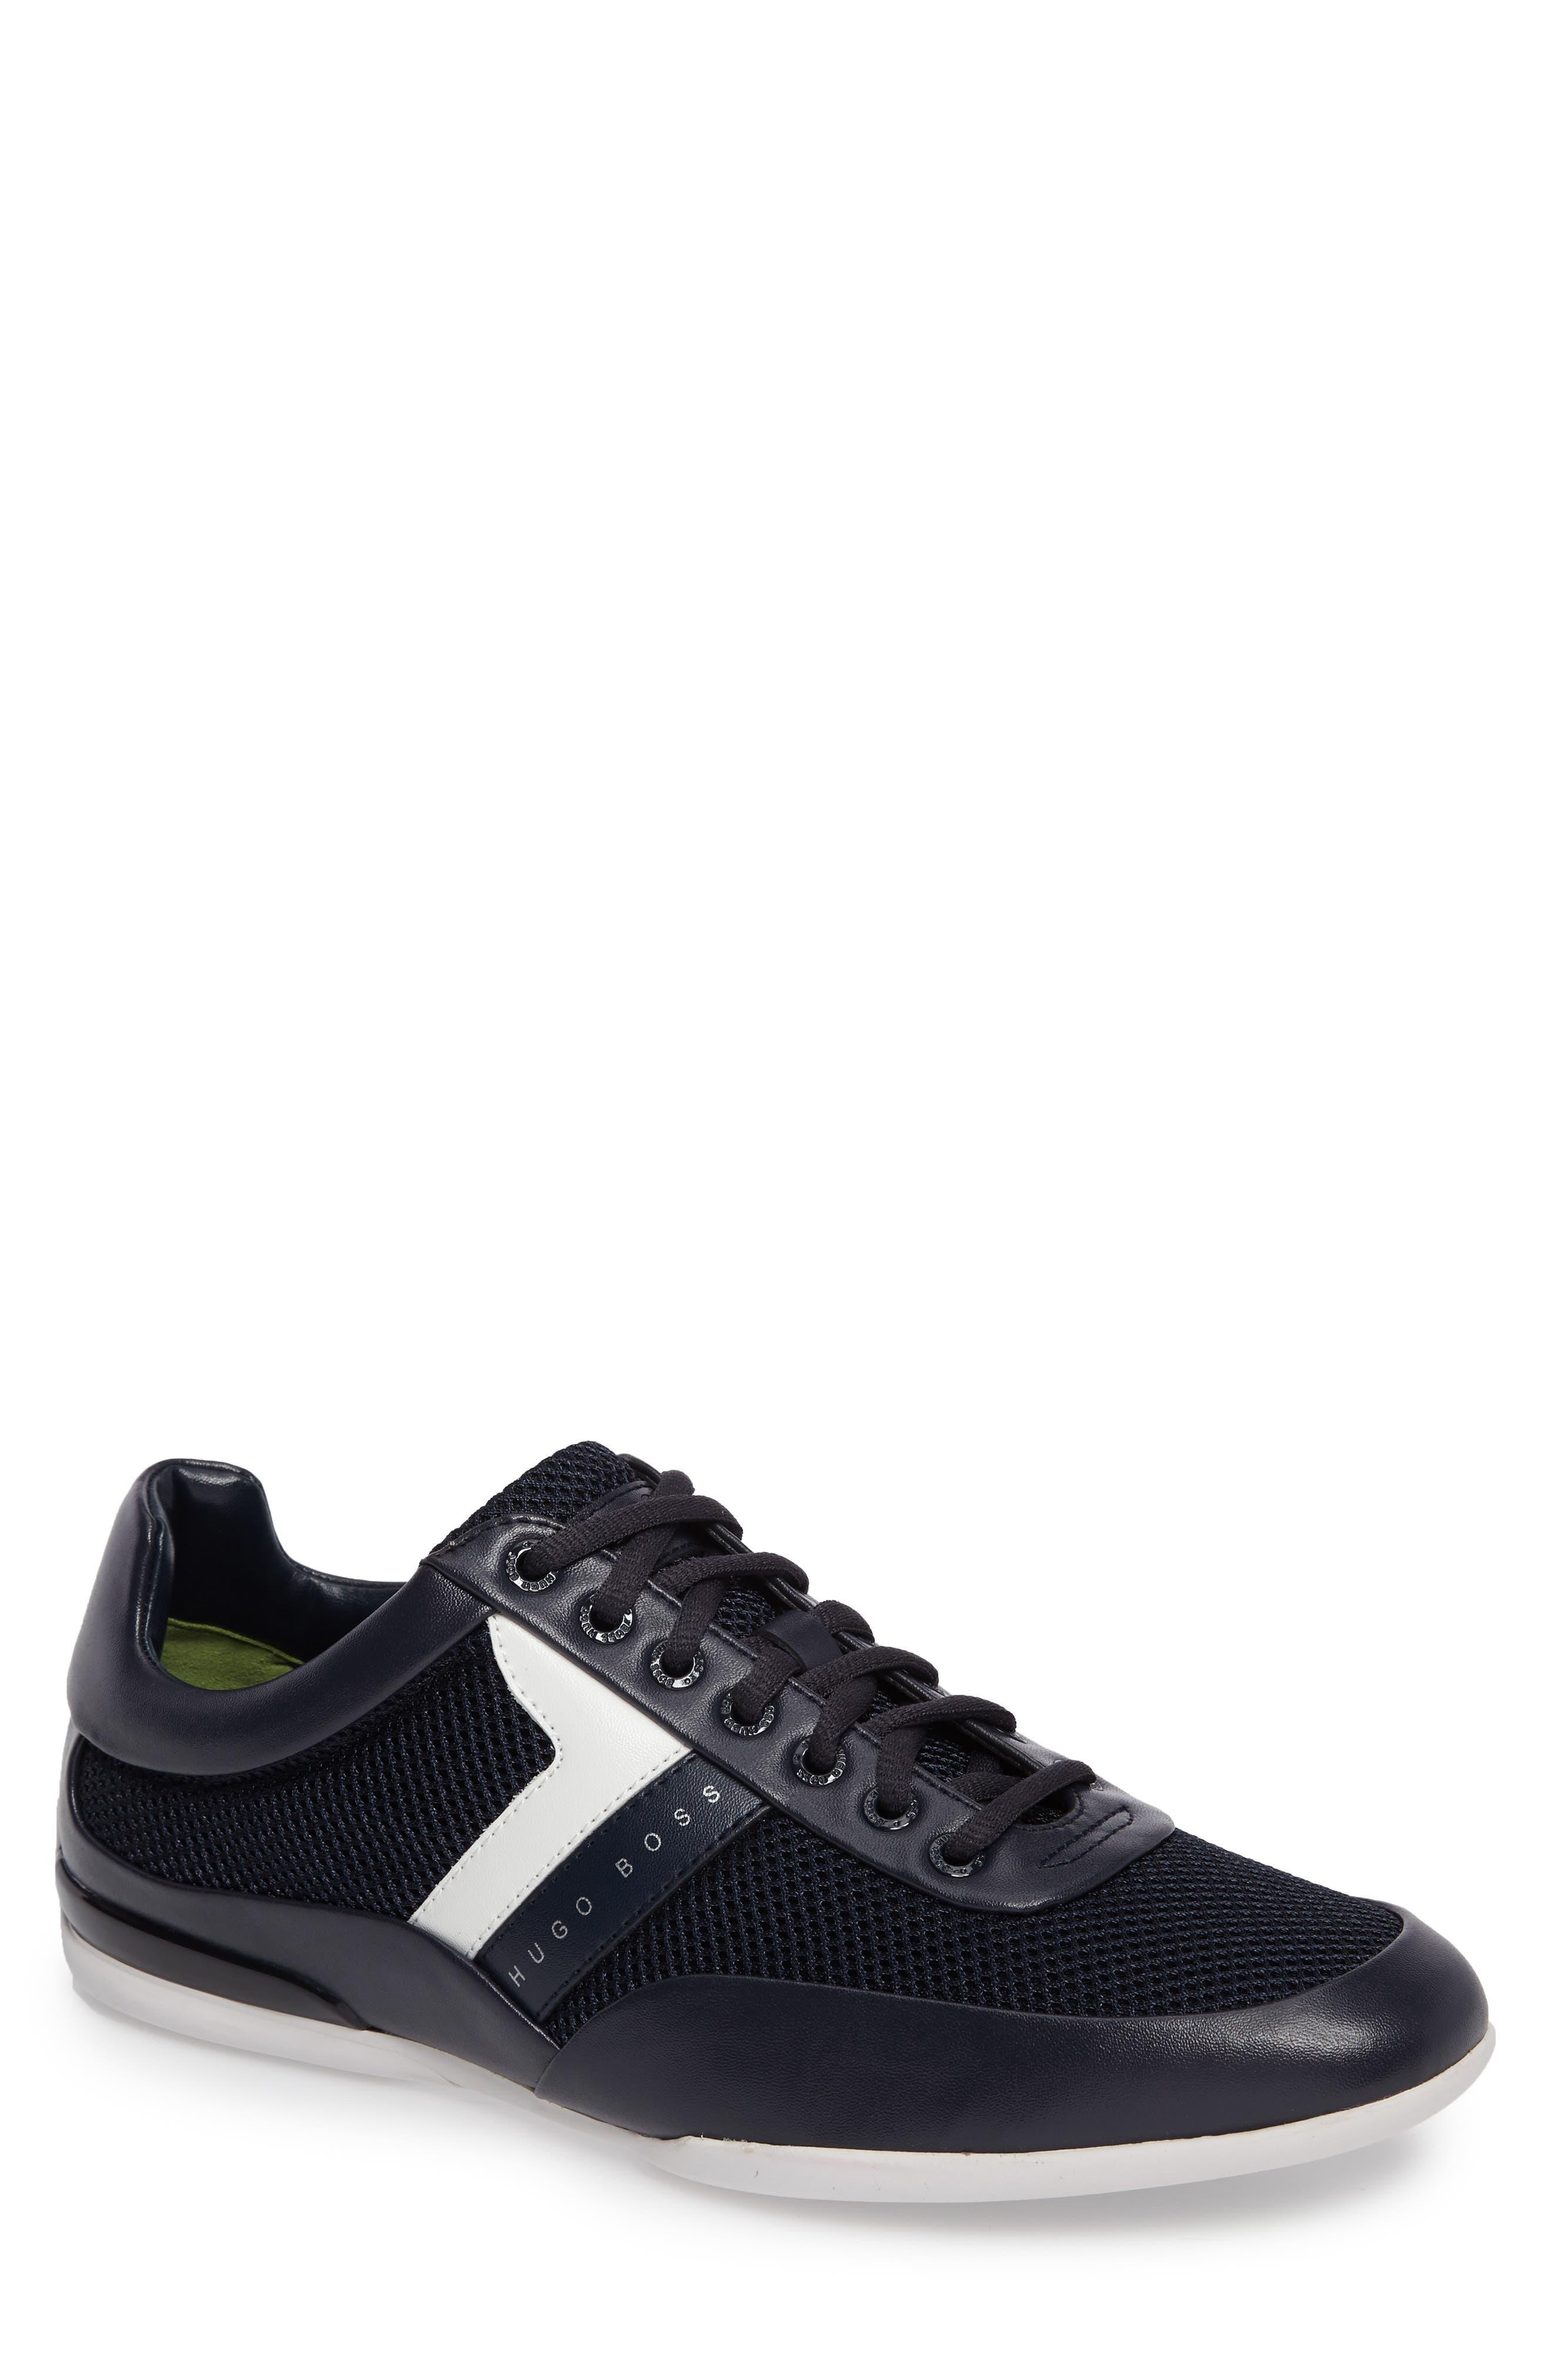 Alternate Image 1 Selected - BOSS Green Space Sneaker (Men)